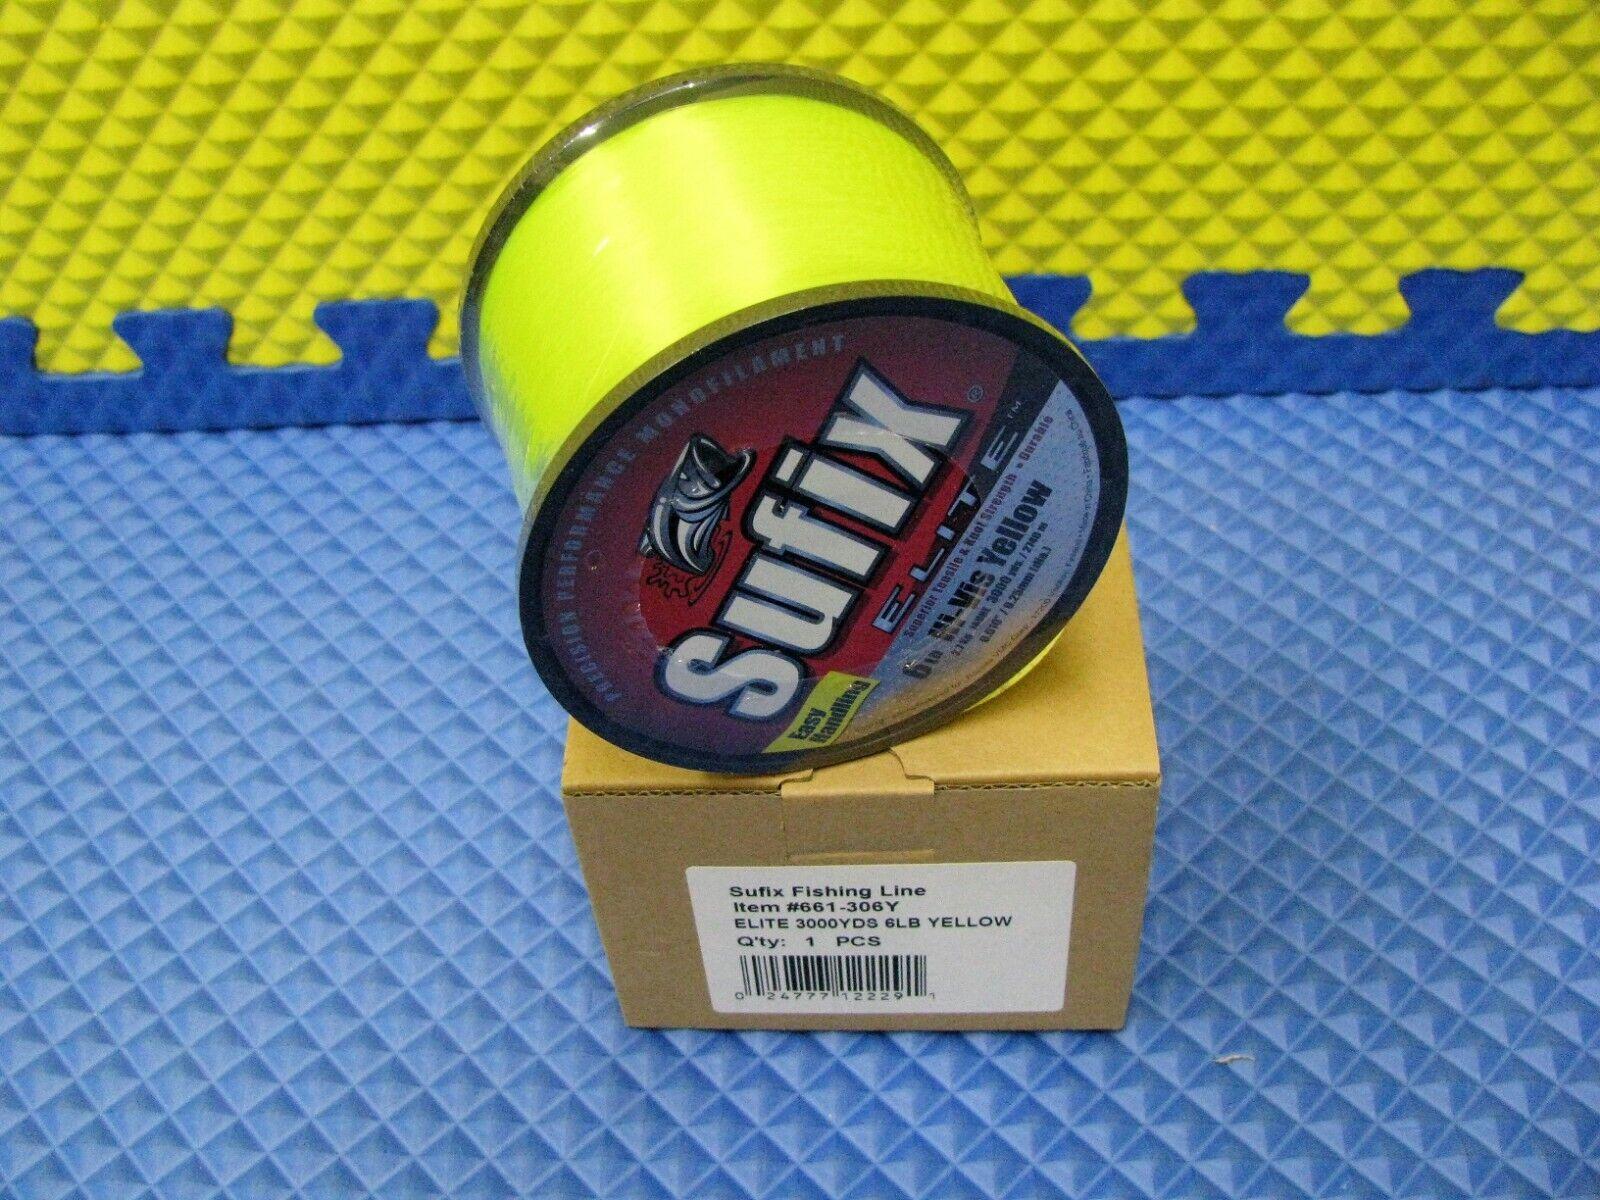 SUFIX Superior Monofilament Fishing Line 30Lb 1795Yd 1# Spool 0.55 Hi-Vis Yellow